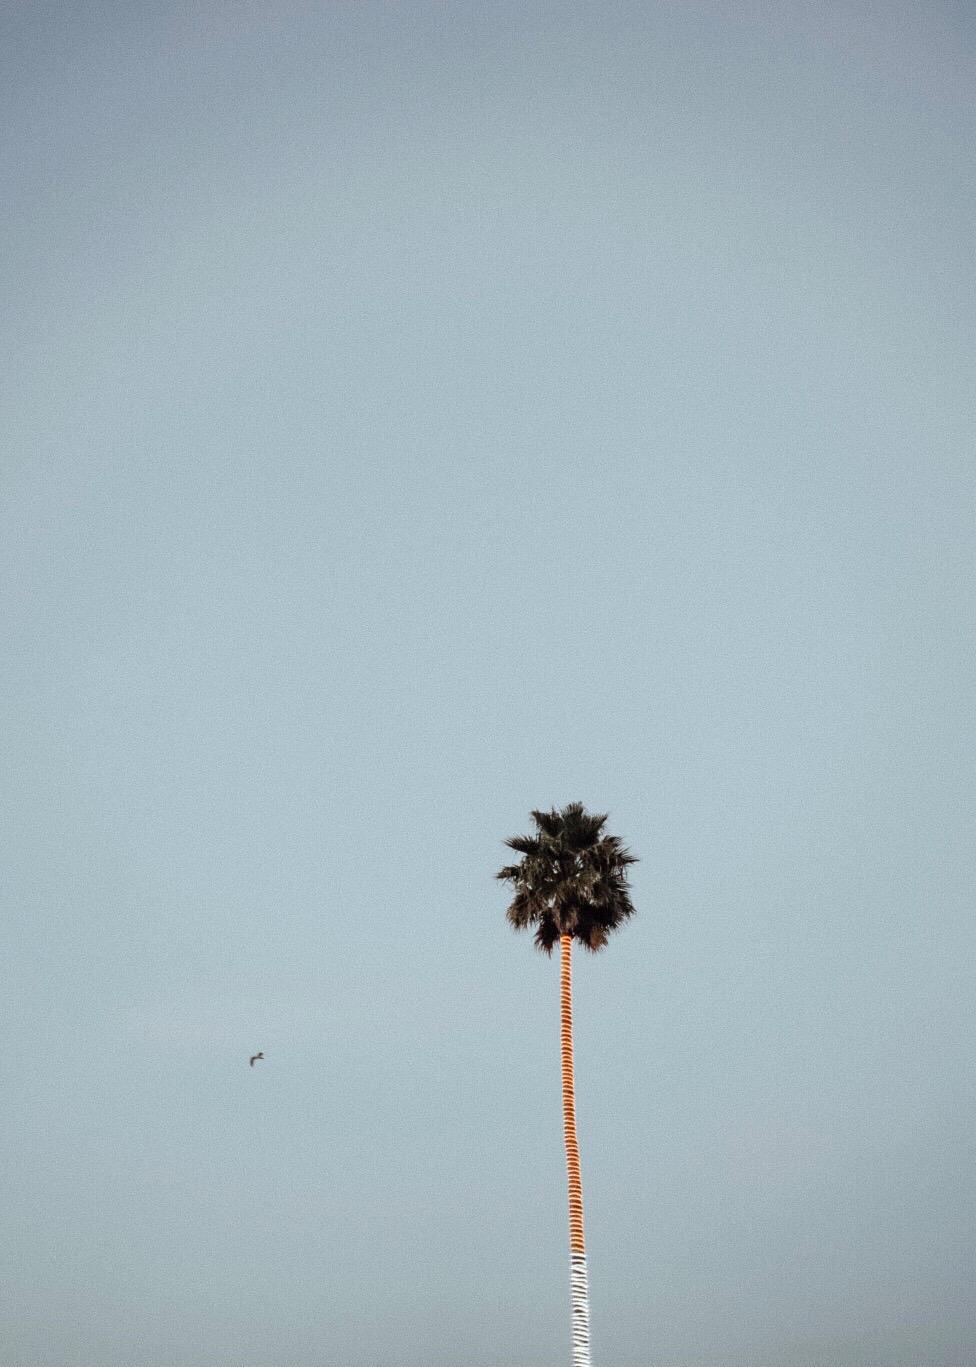 PALM_TREE_SANTA_CRUZ_CALIFORNIA